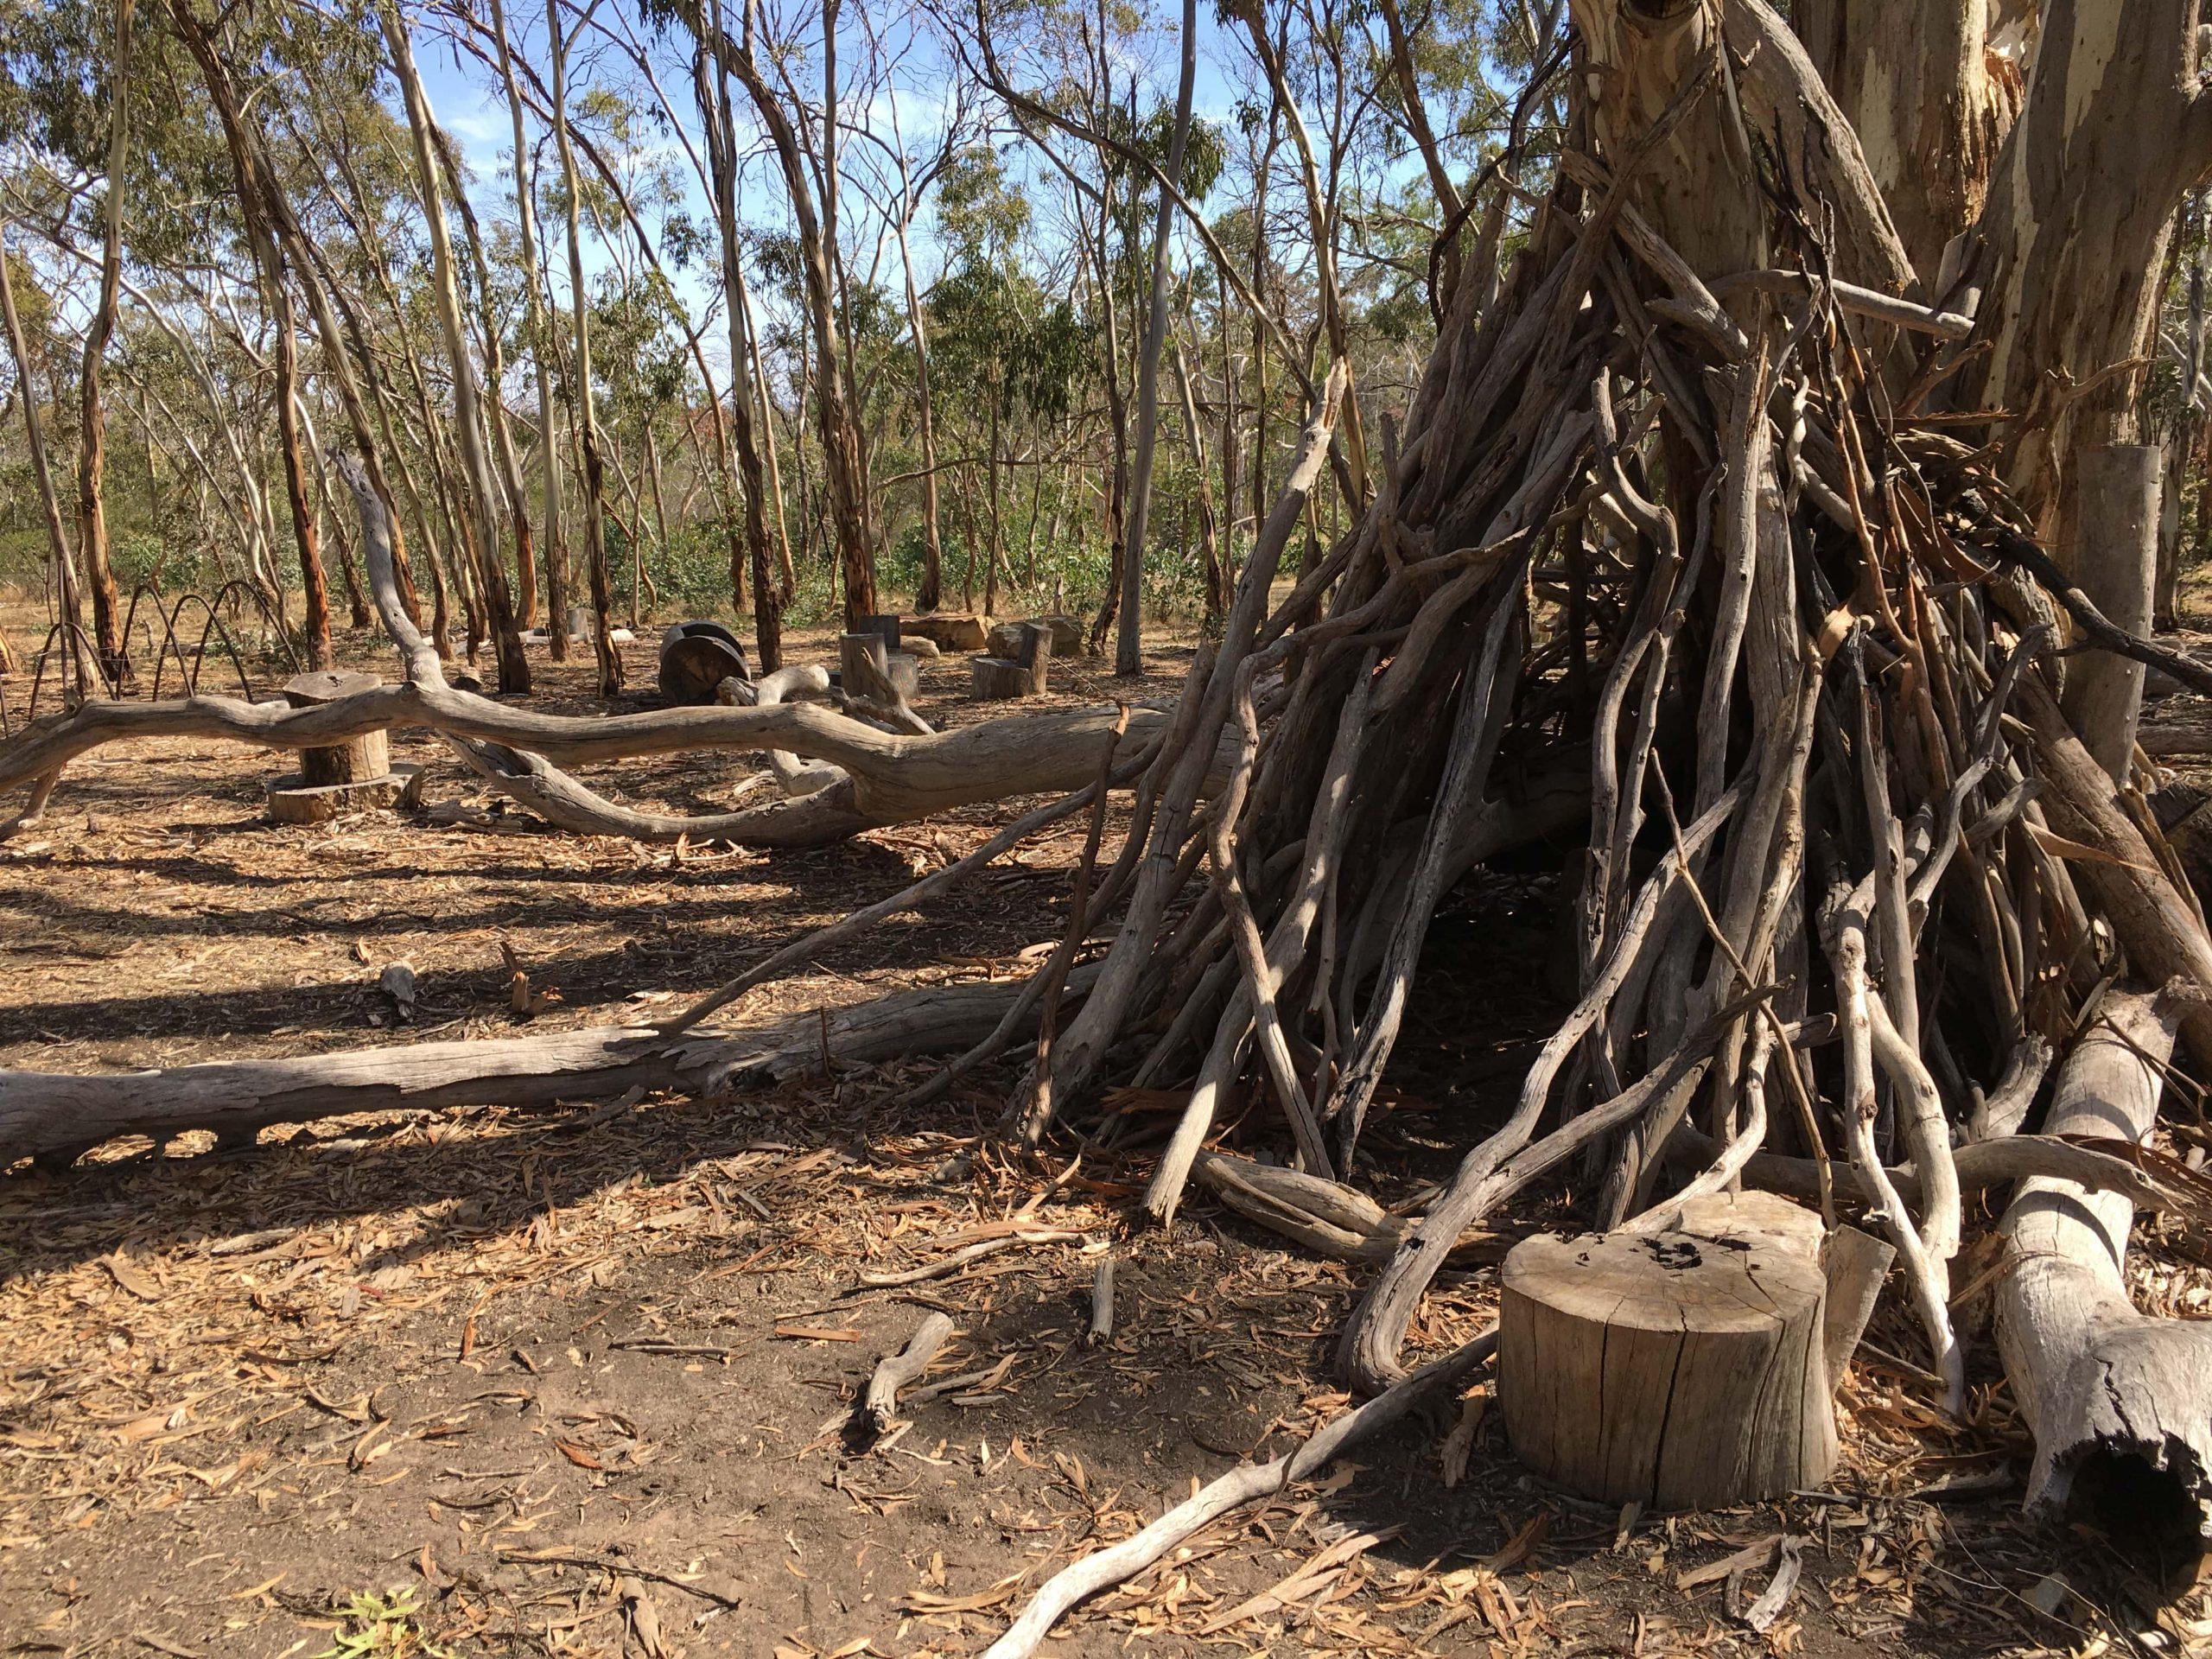 Destination Para Wirra Campground – A great local getaway